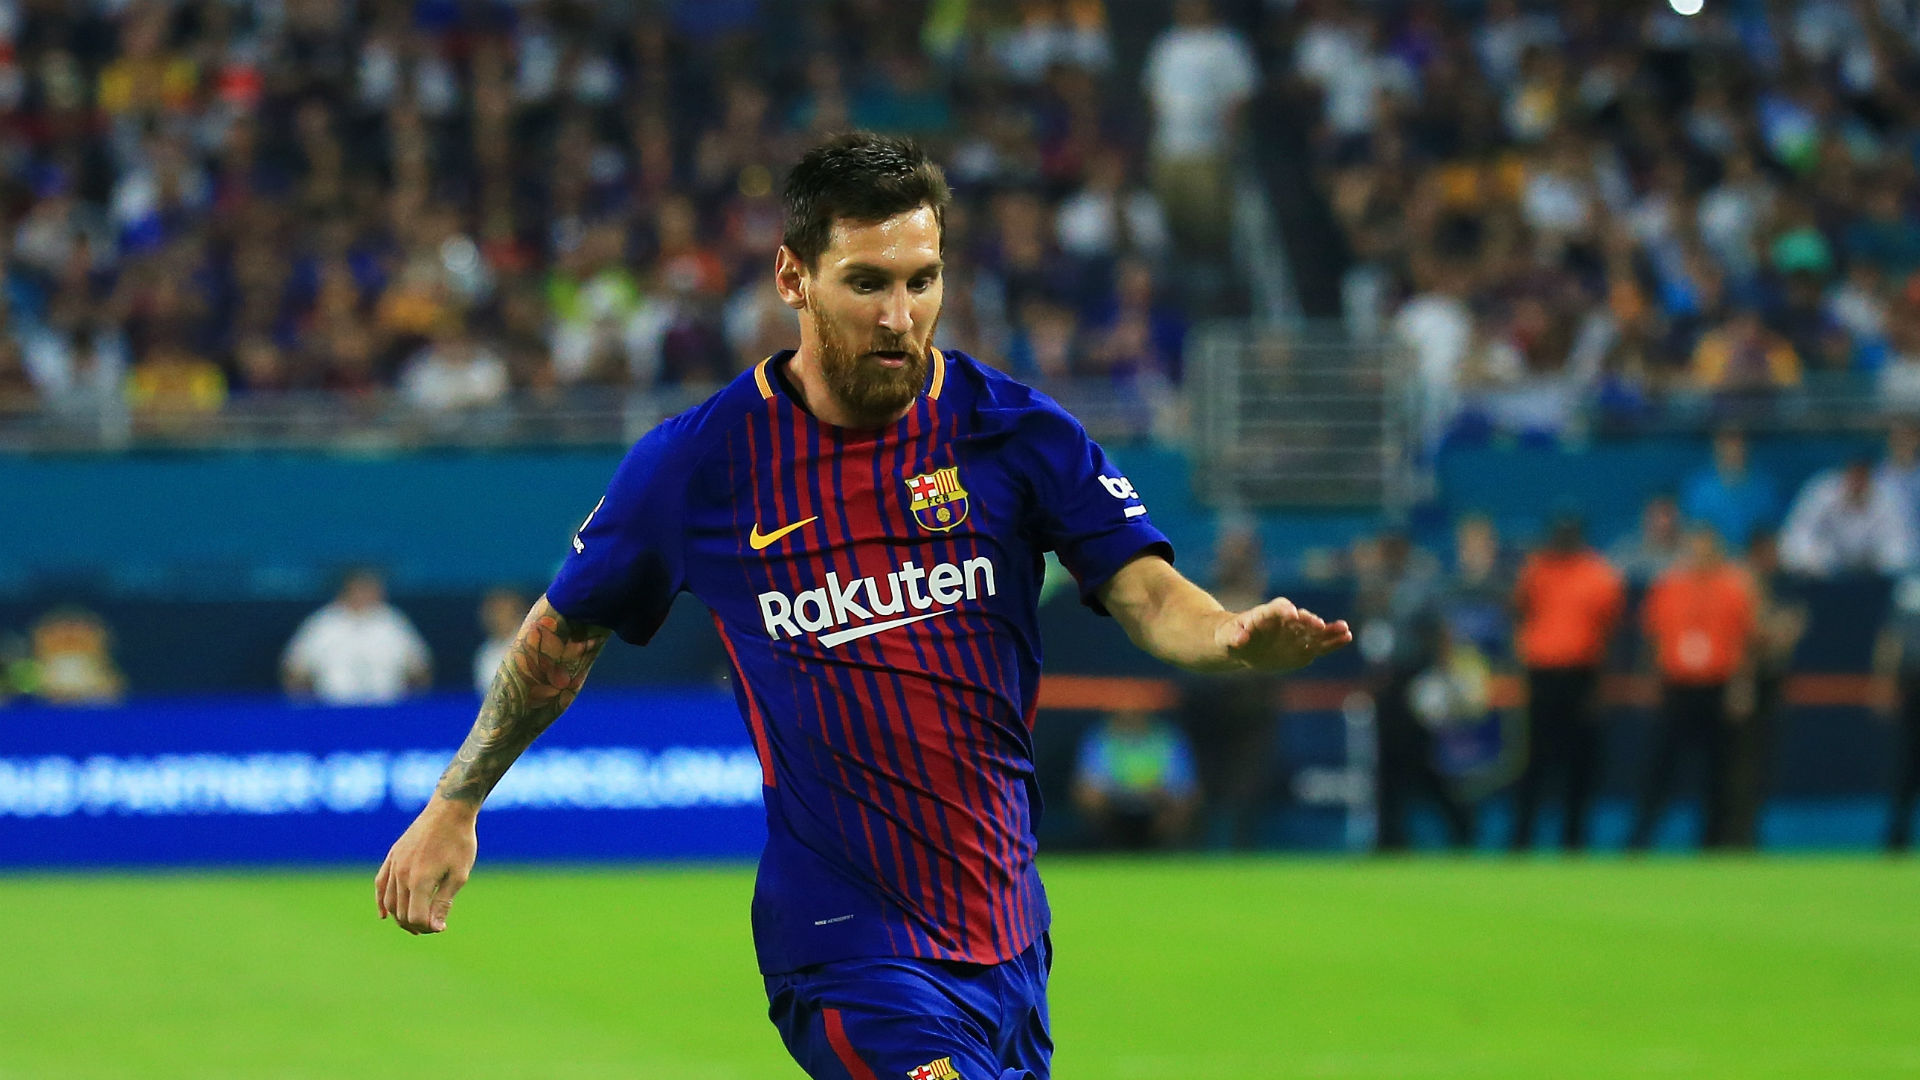 Opponent team fan spat in Lionel Messi 12/21/2015 76